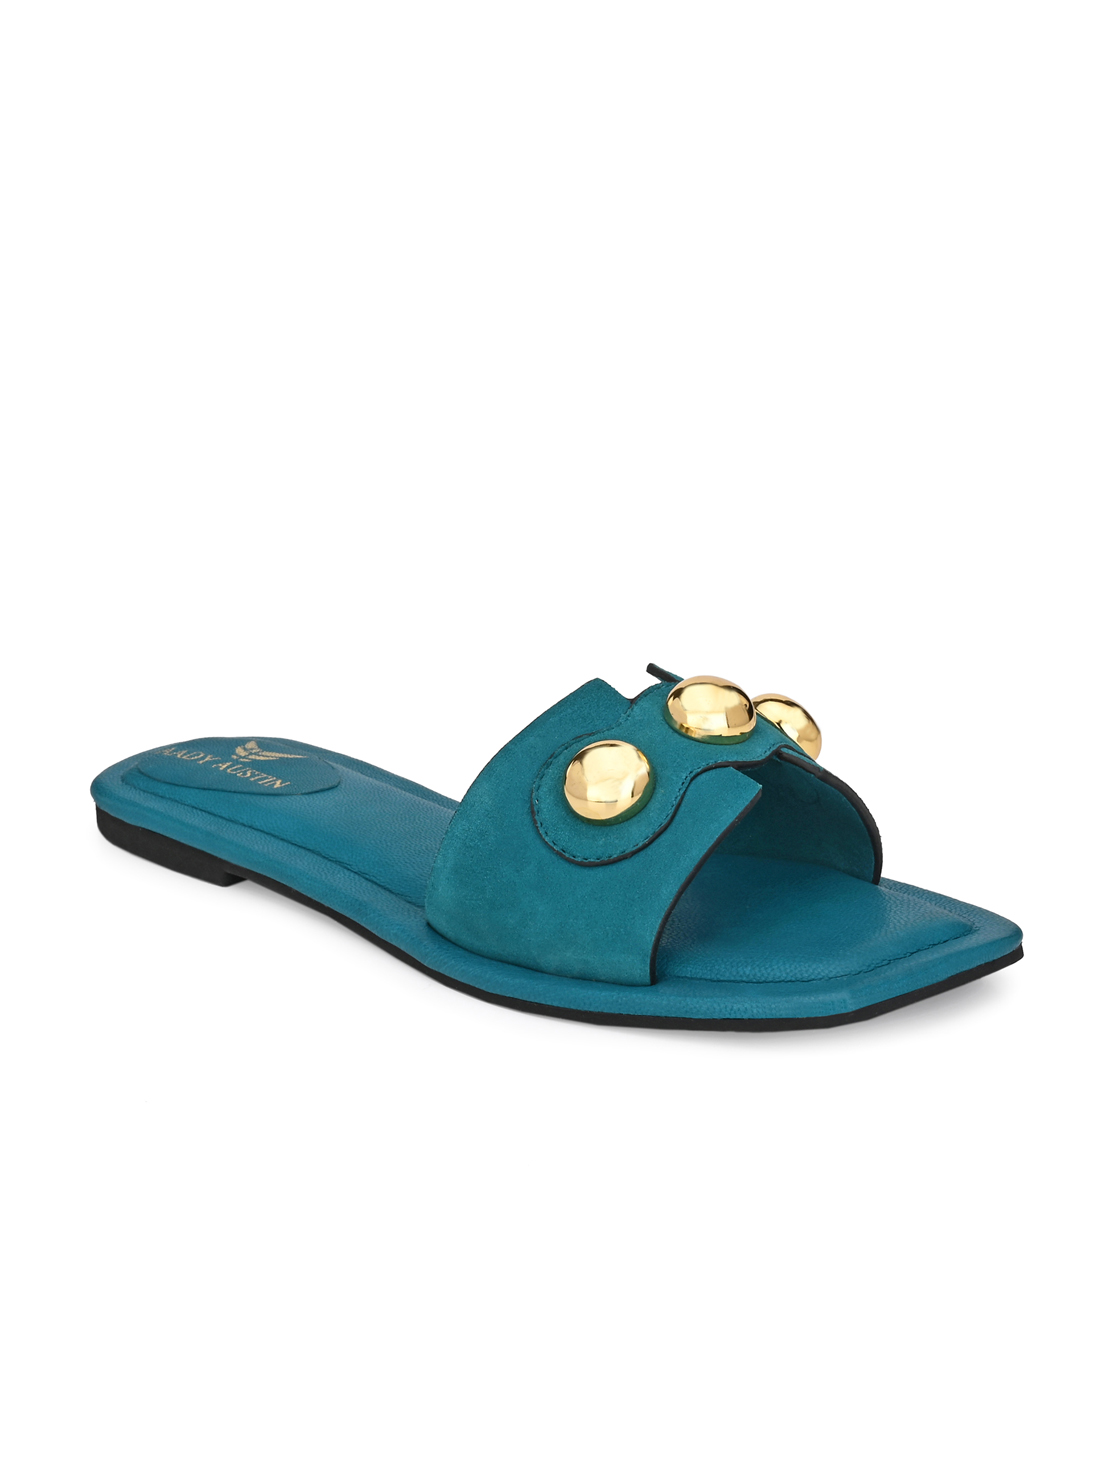 AADY AUSTIN | Aady Austin Women's Trendy Blue Square Toe Flats